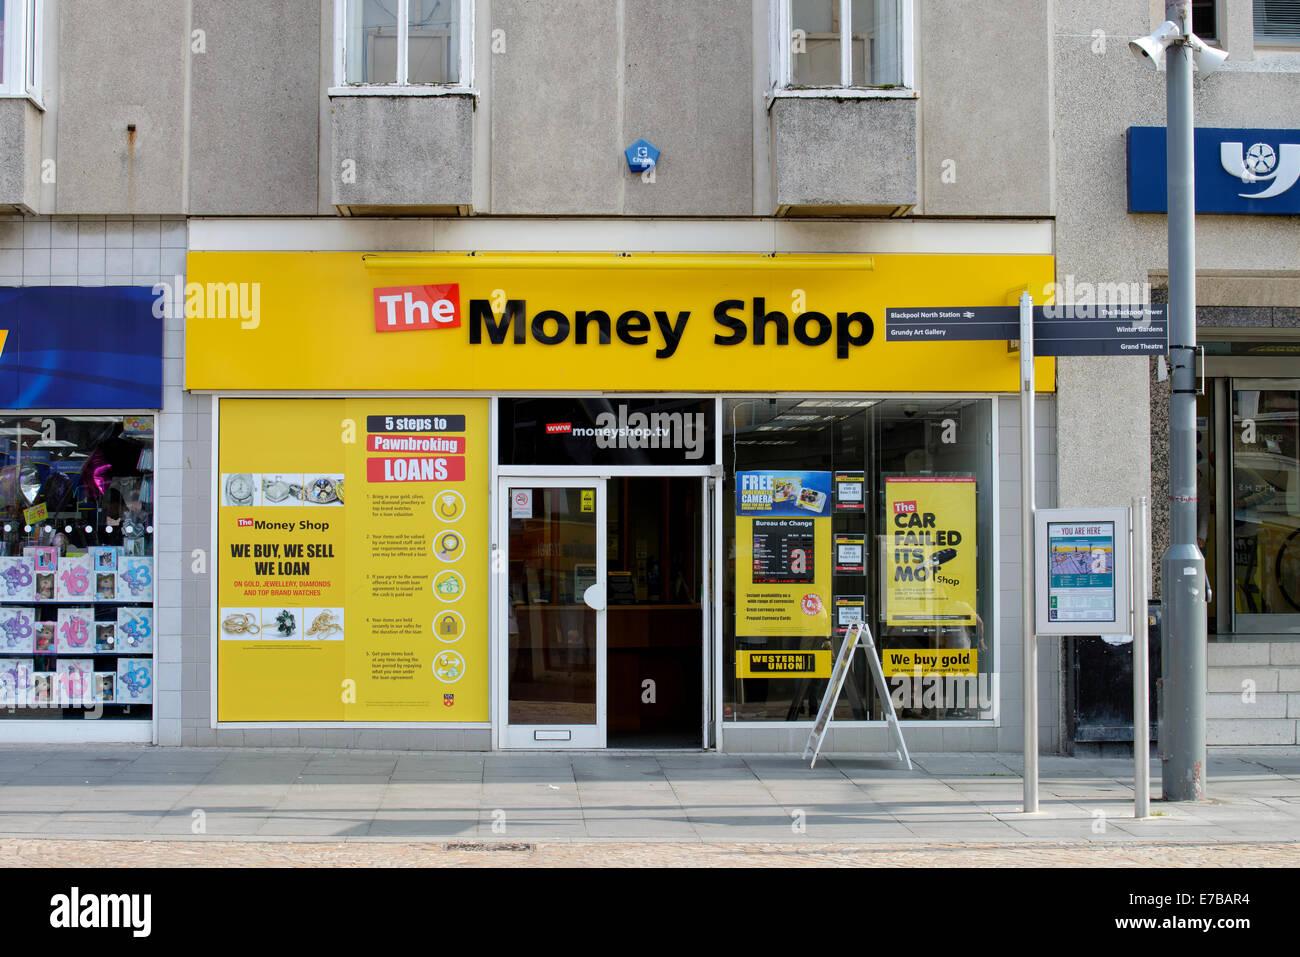 Cash loans barclays photo 2